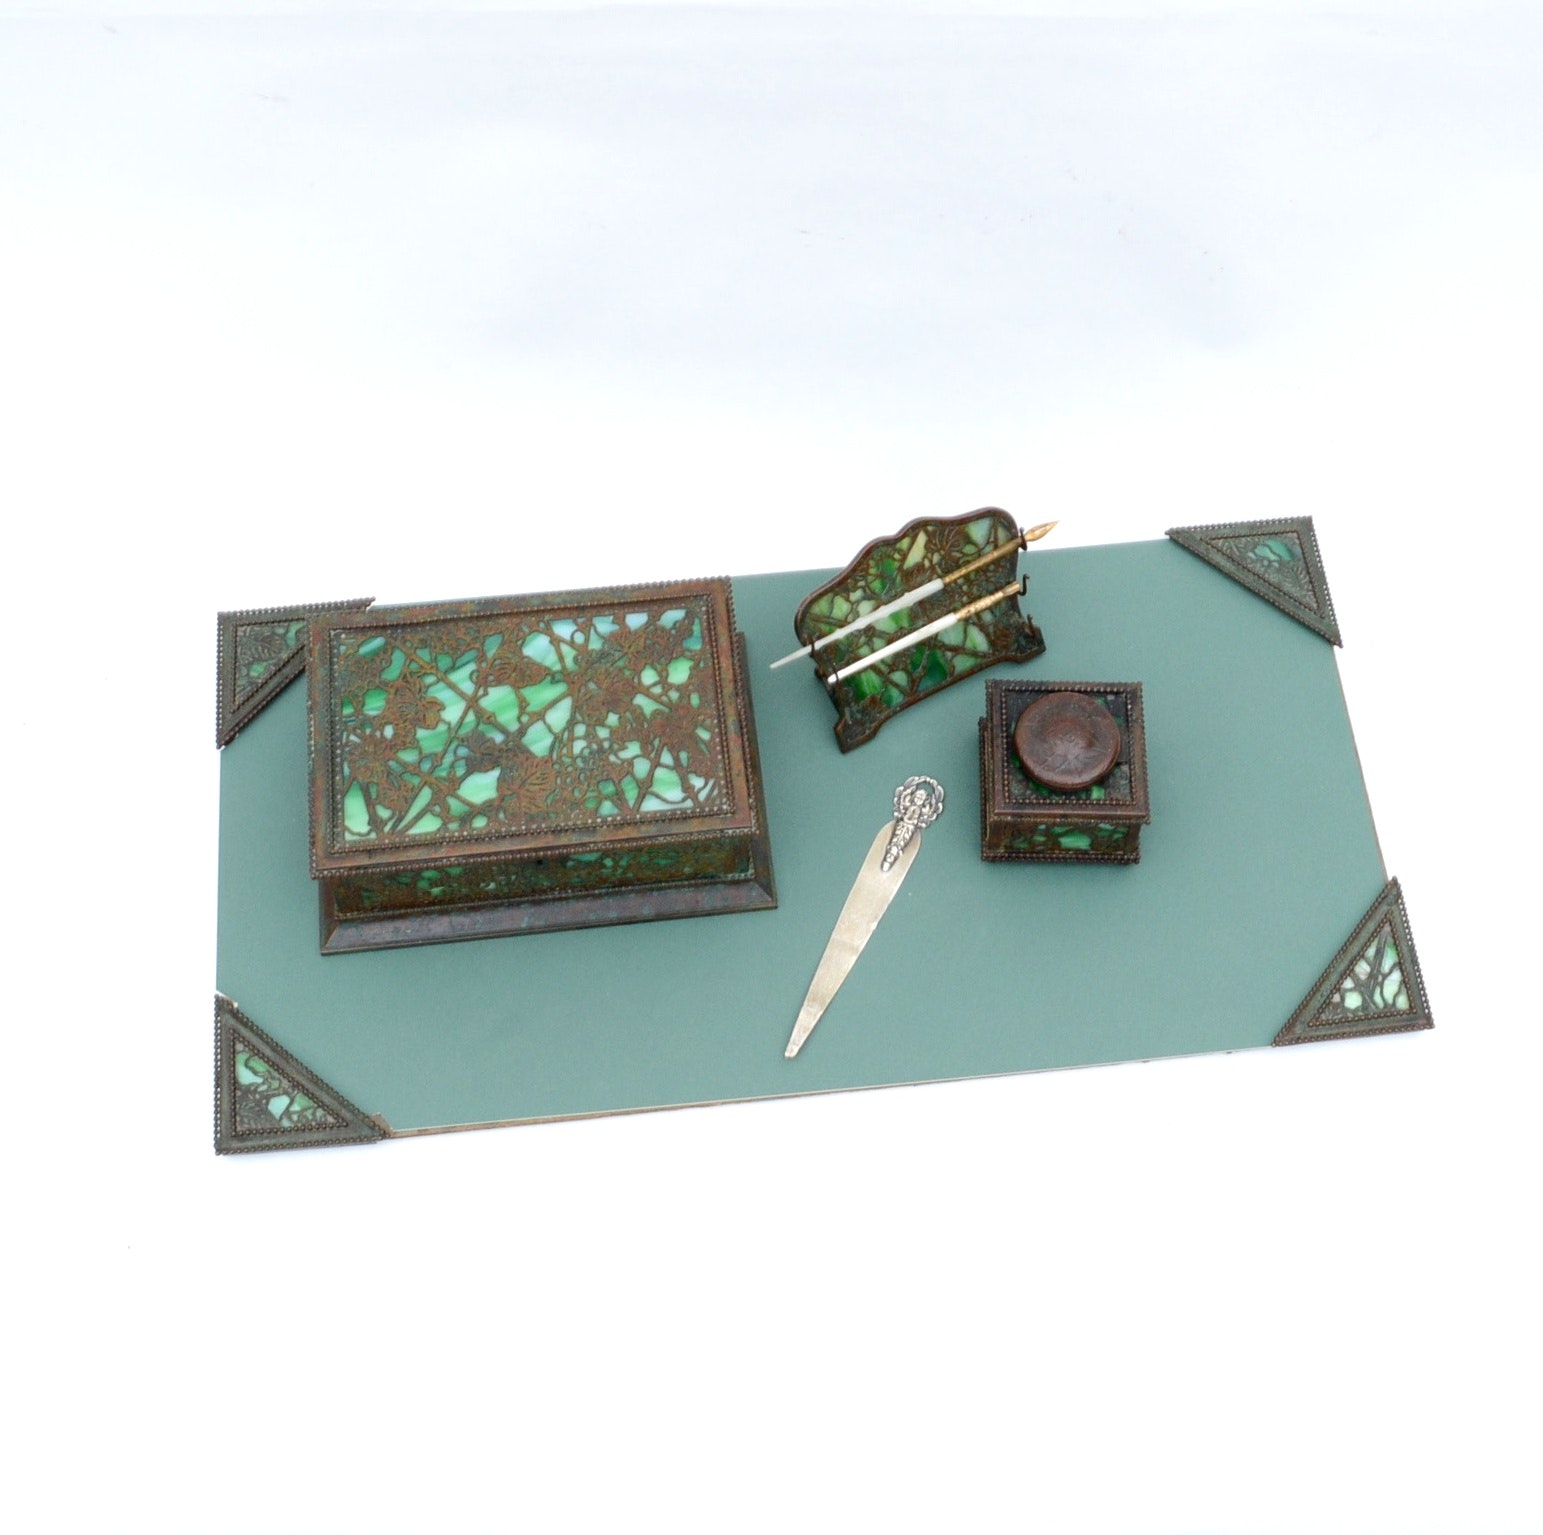 Tiffany Studios Favrile Glass and Bronze Desk Set